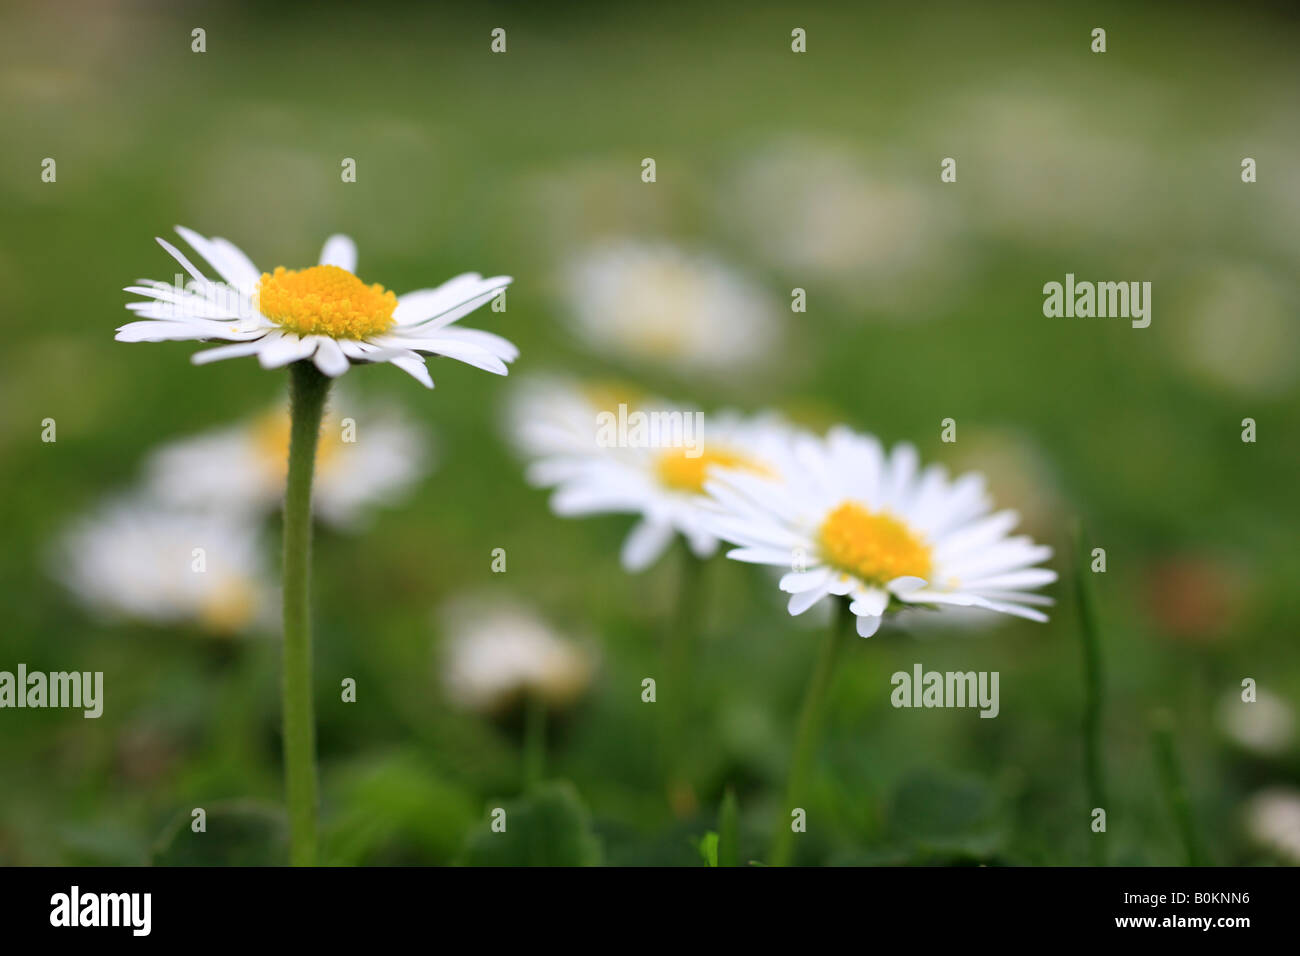 Common 'Lawn Daisies' 'Bellis perennis' - Stock Image